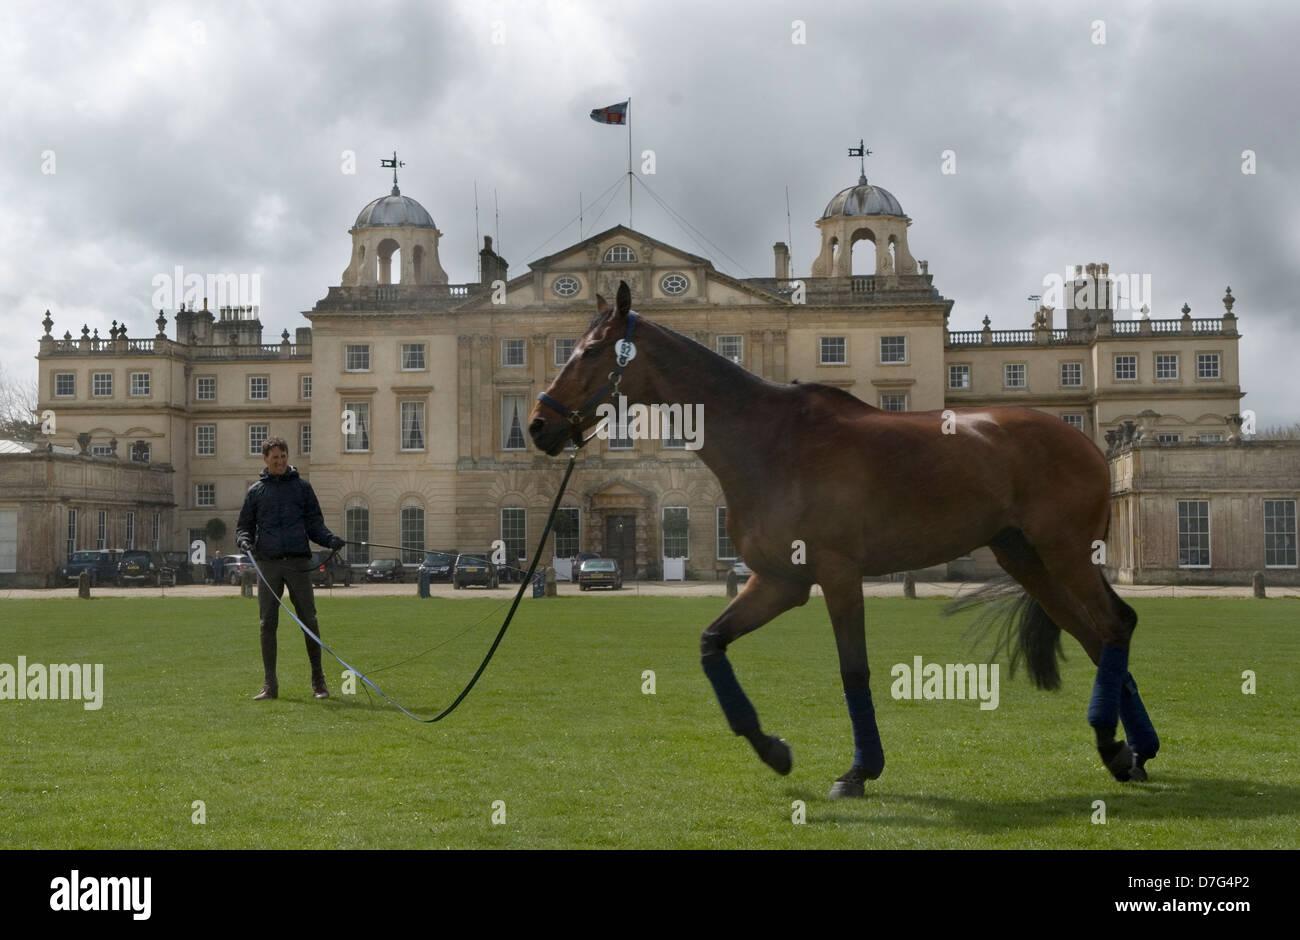 Trade Stands Badminton Horse Trials : Badminton horse trials british eventing stock photos & badminton